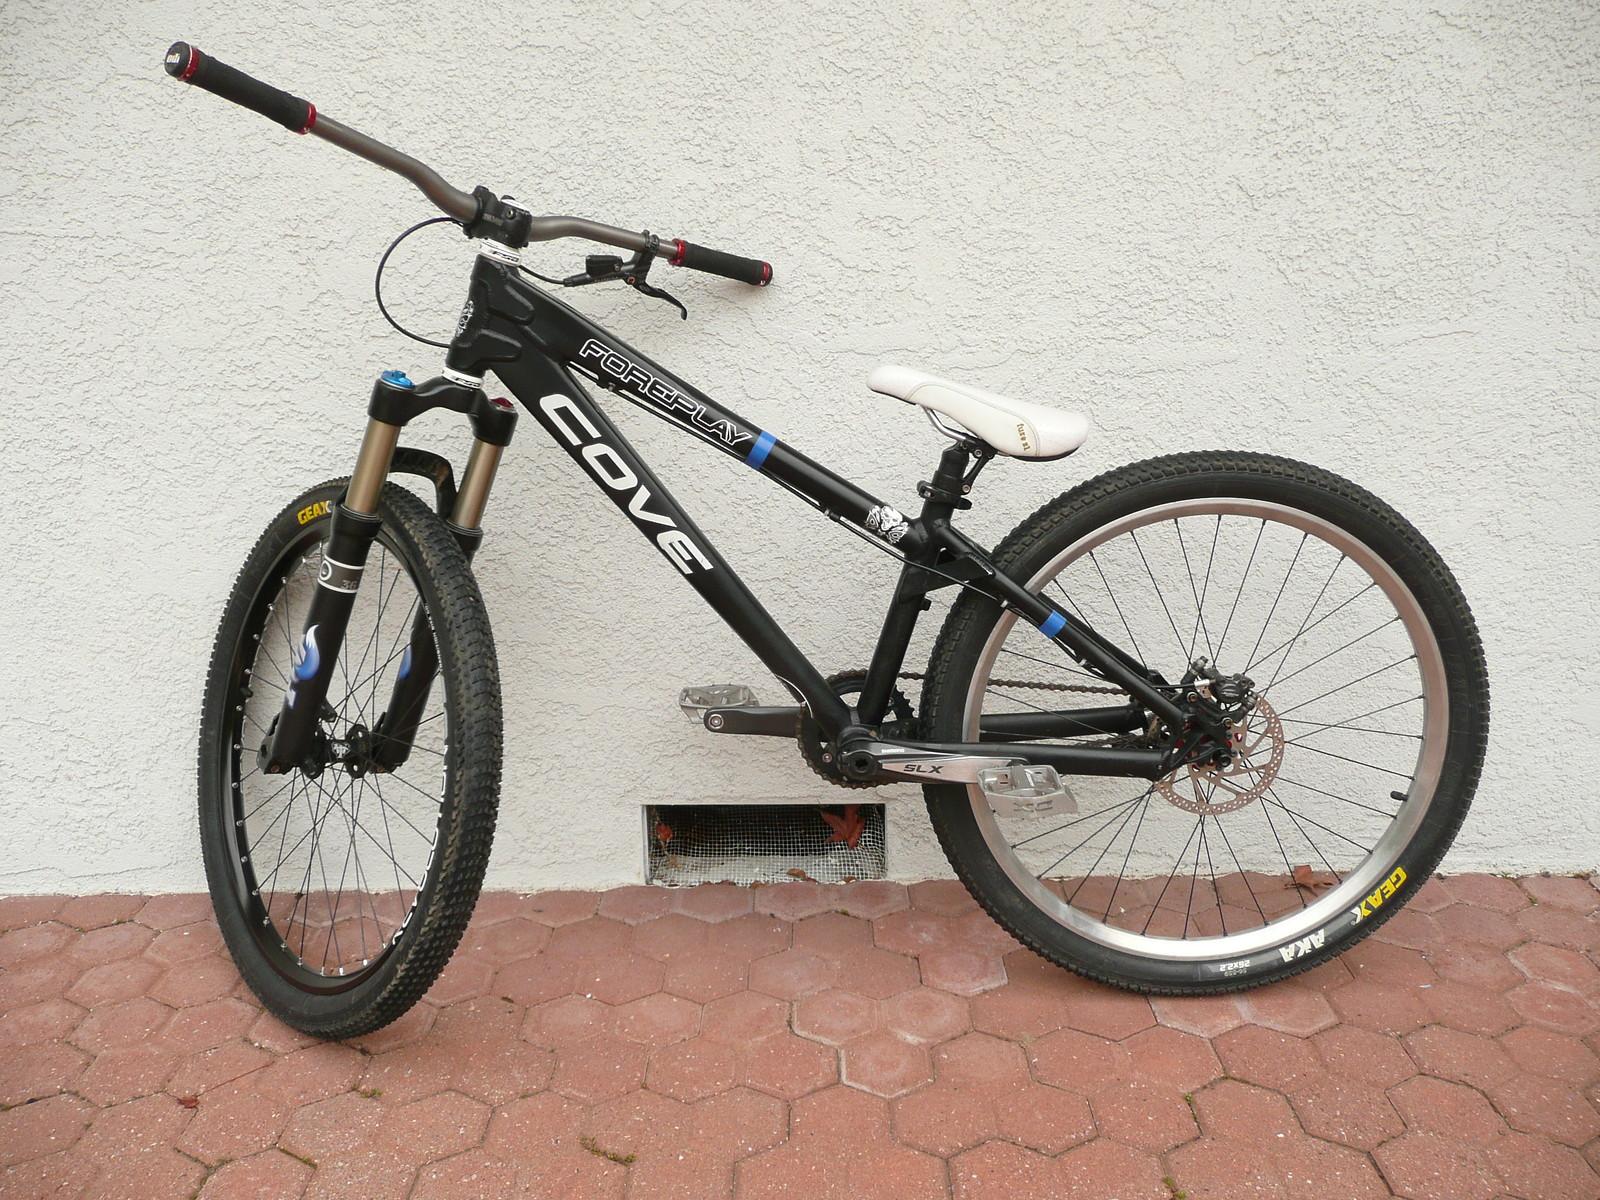 P1040244 - kevinridesfelt - Mountain Biking Pictures - Vital MTB